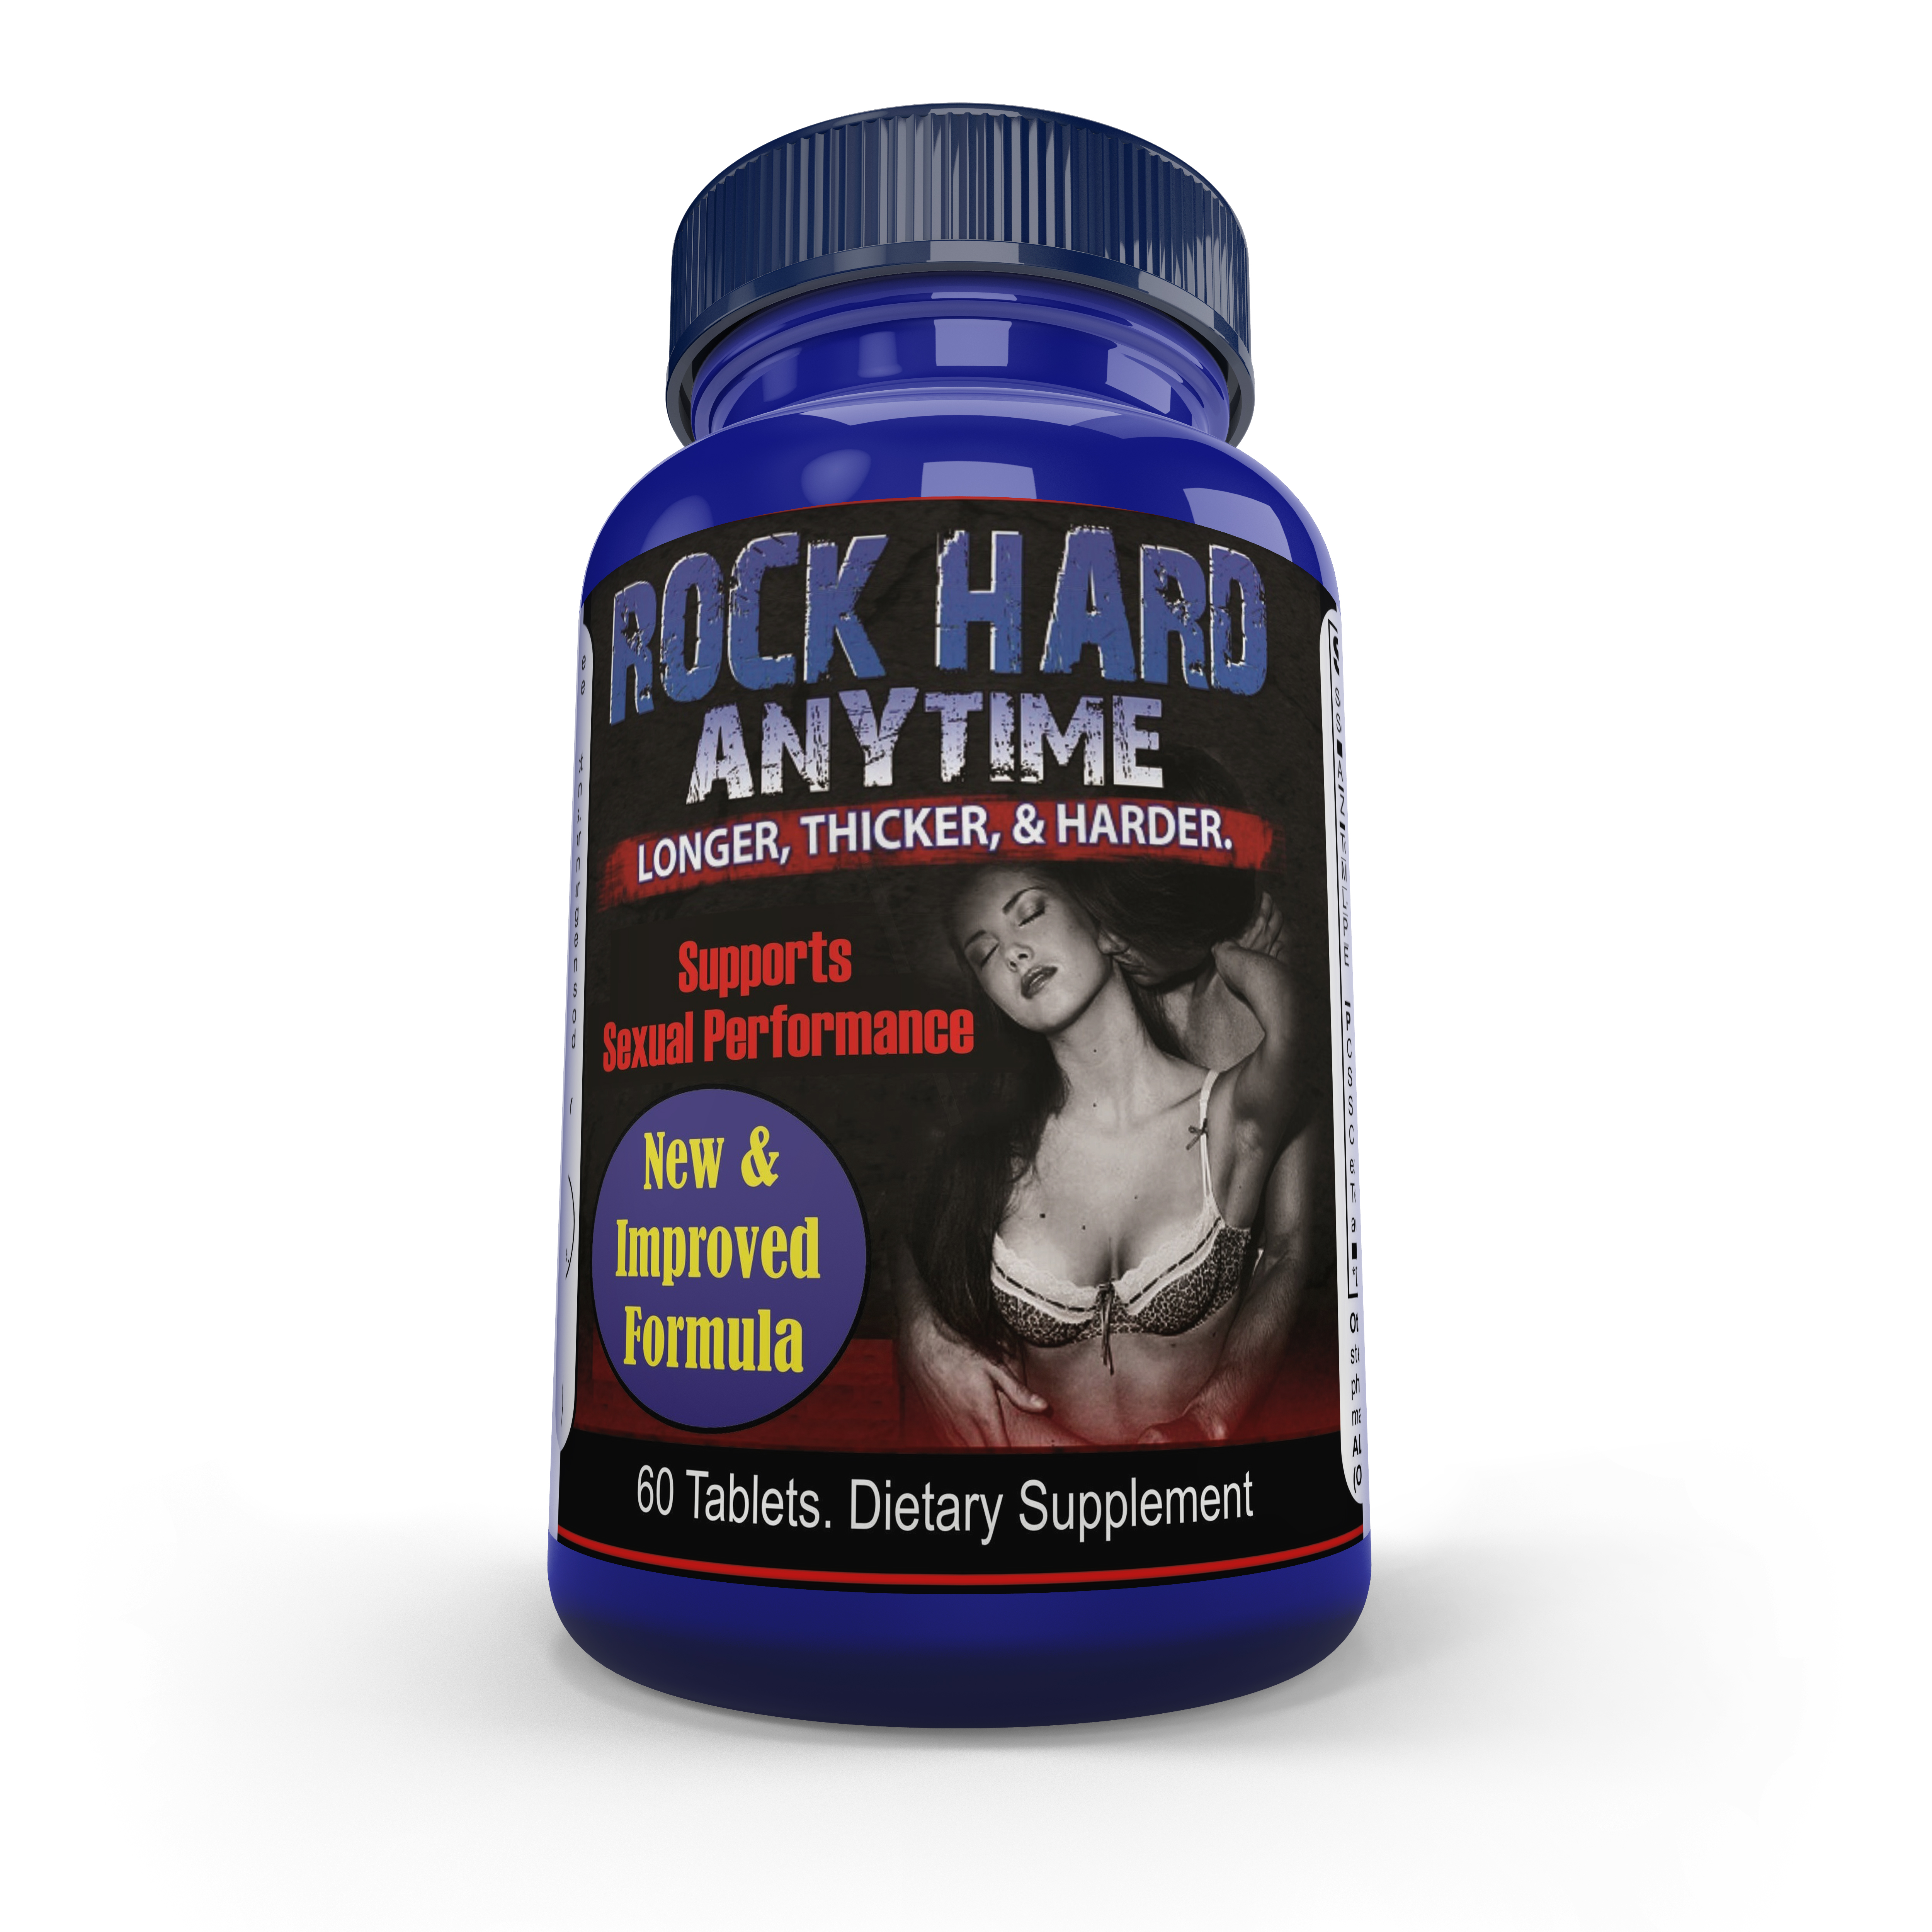 RH ANYTIME- Testosterone Booster For Men Increase Strength Stamina Energy Best Energy Pills